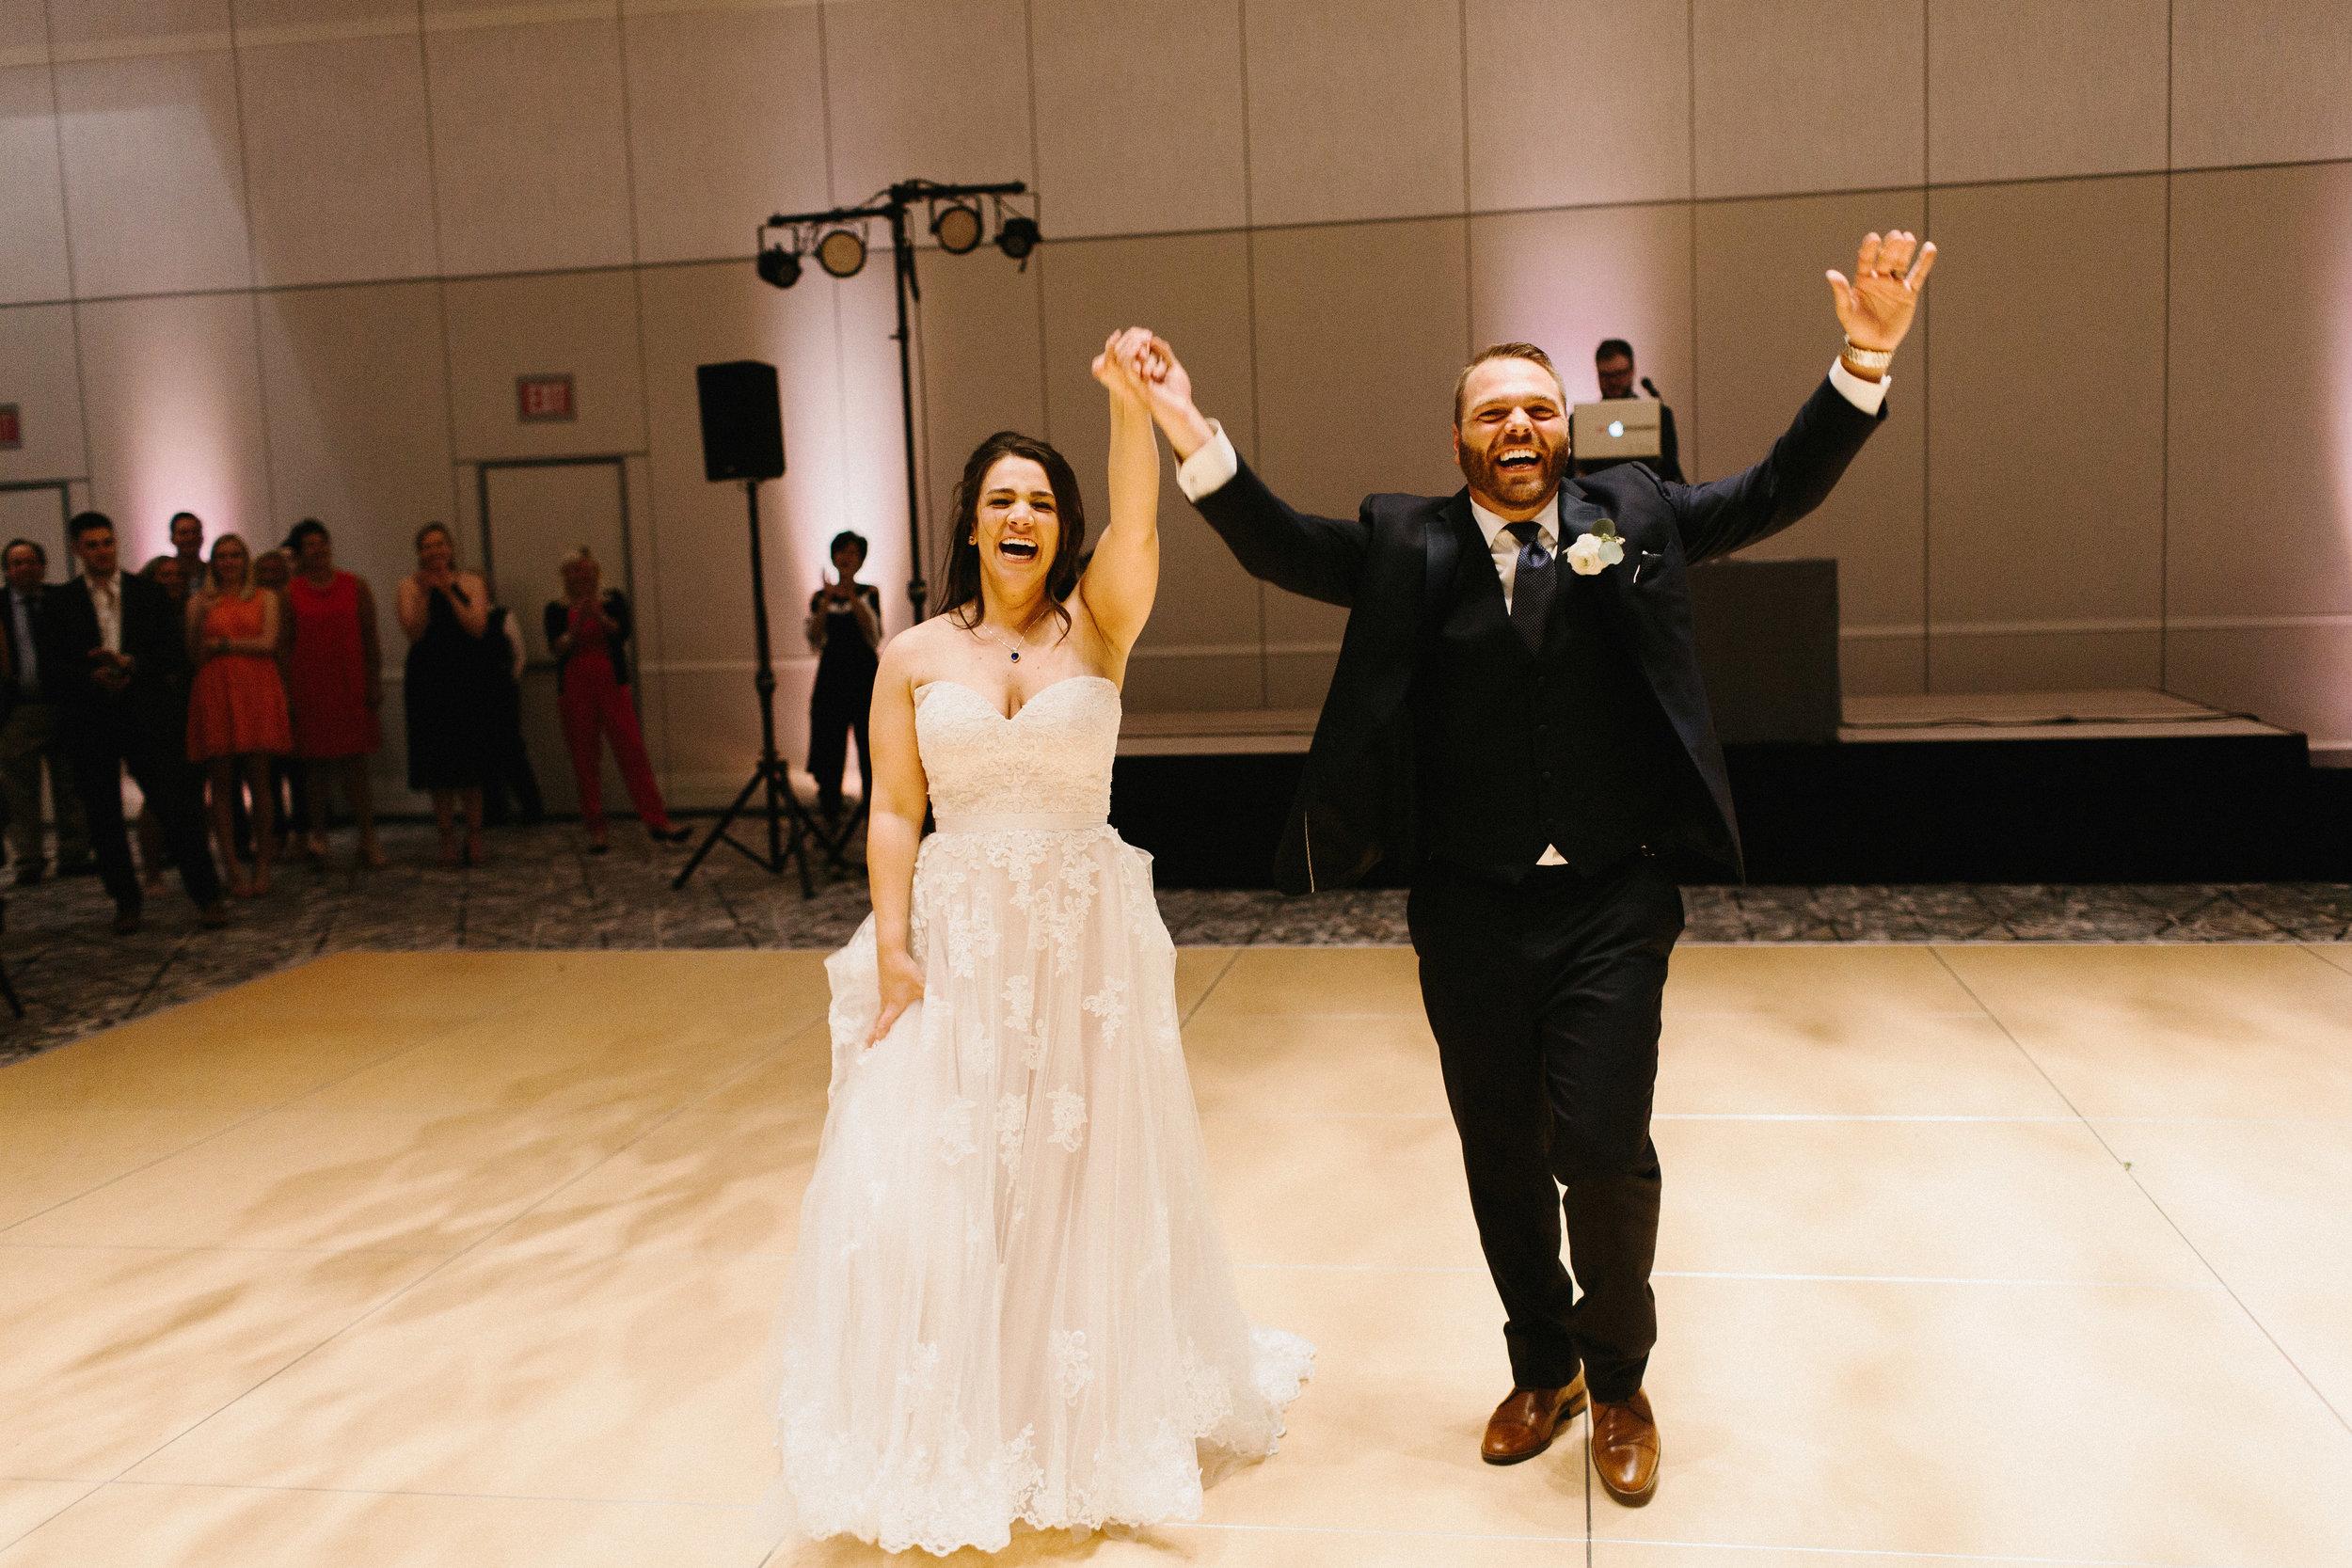 roswell_st_peter_chanel_catholic_avalon_hotel_alpharetta_wedding-2046.jpg